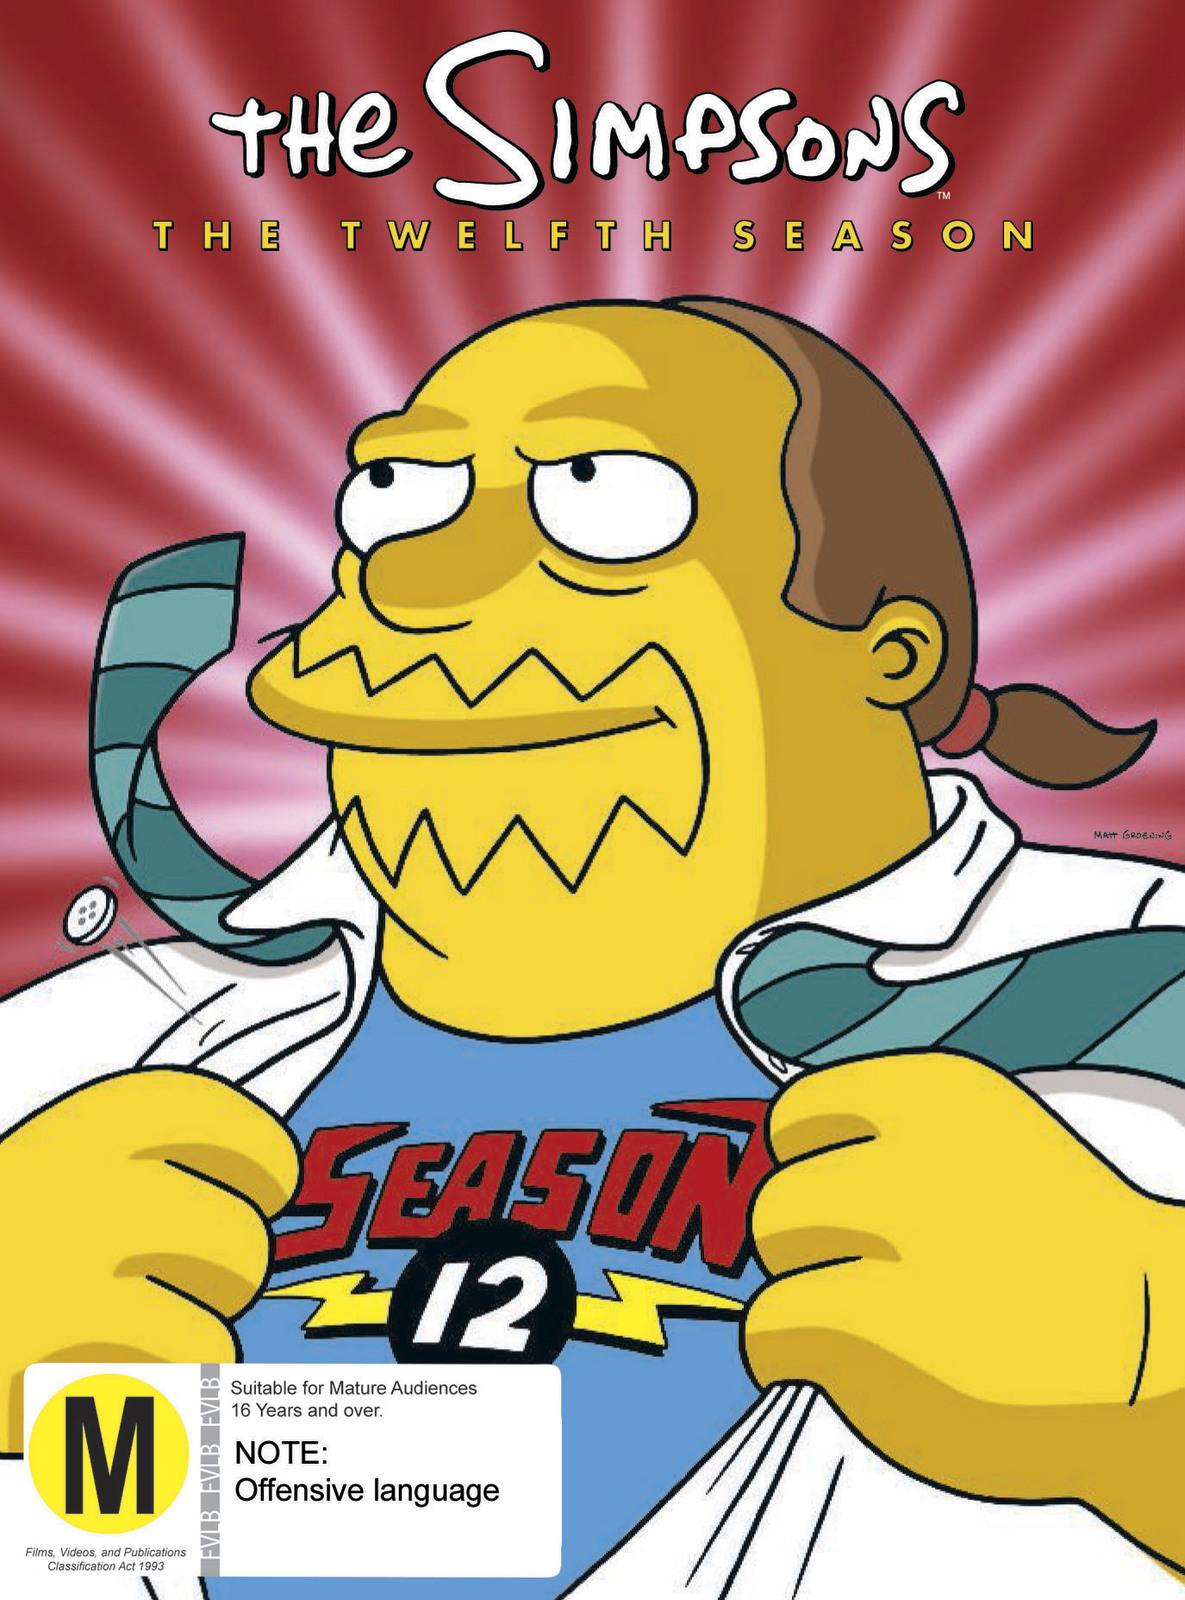 The Simpsons - The Twelfth Season on DVD image